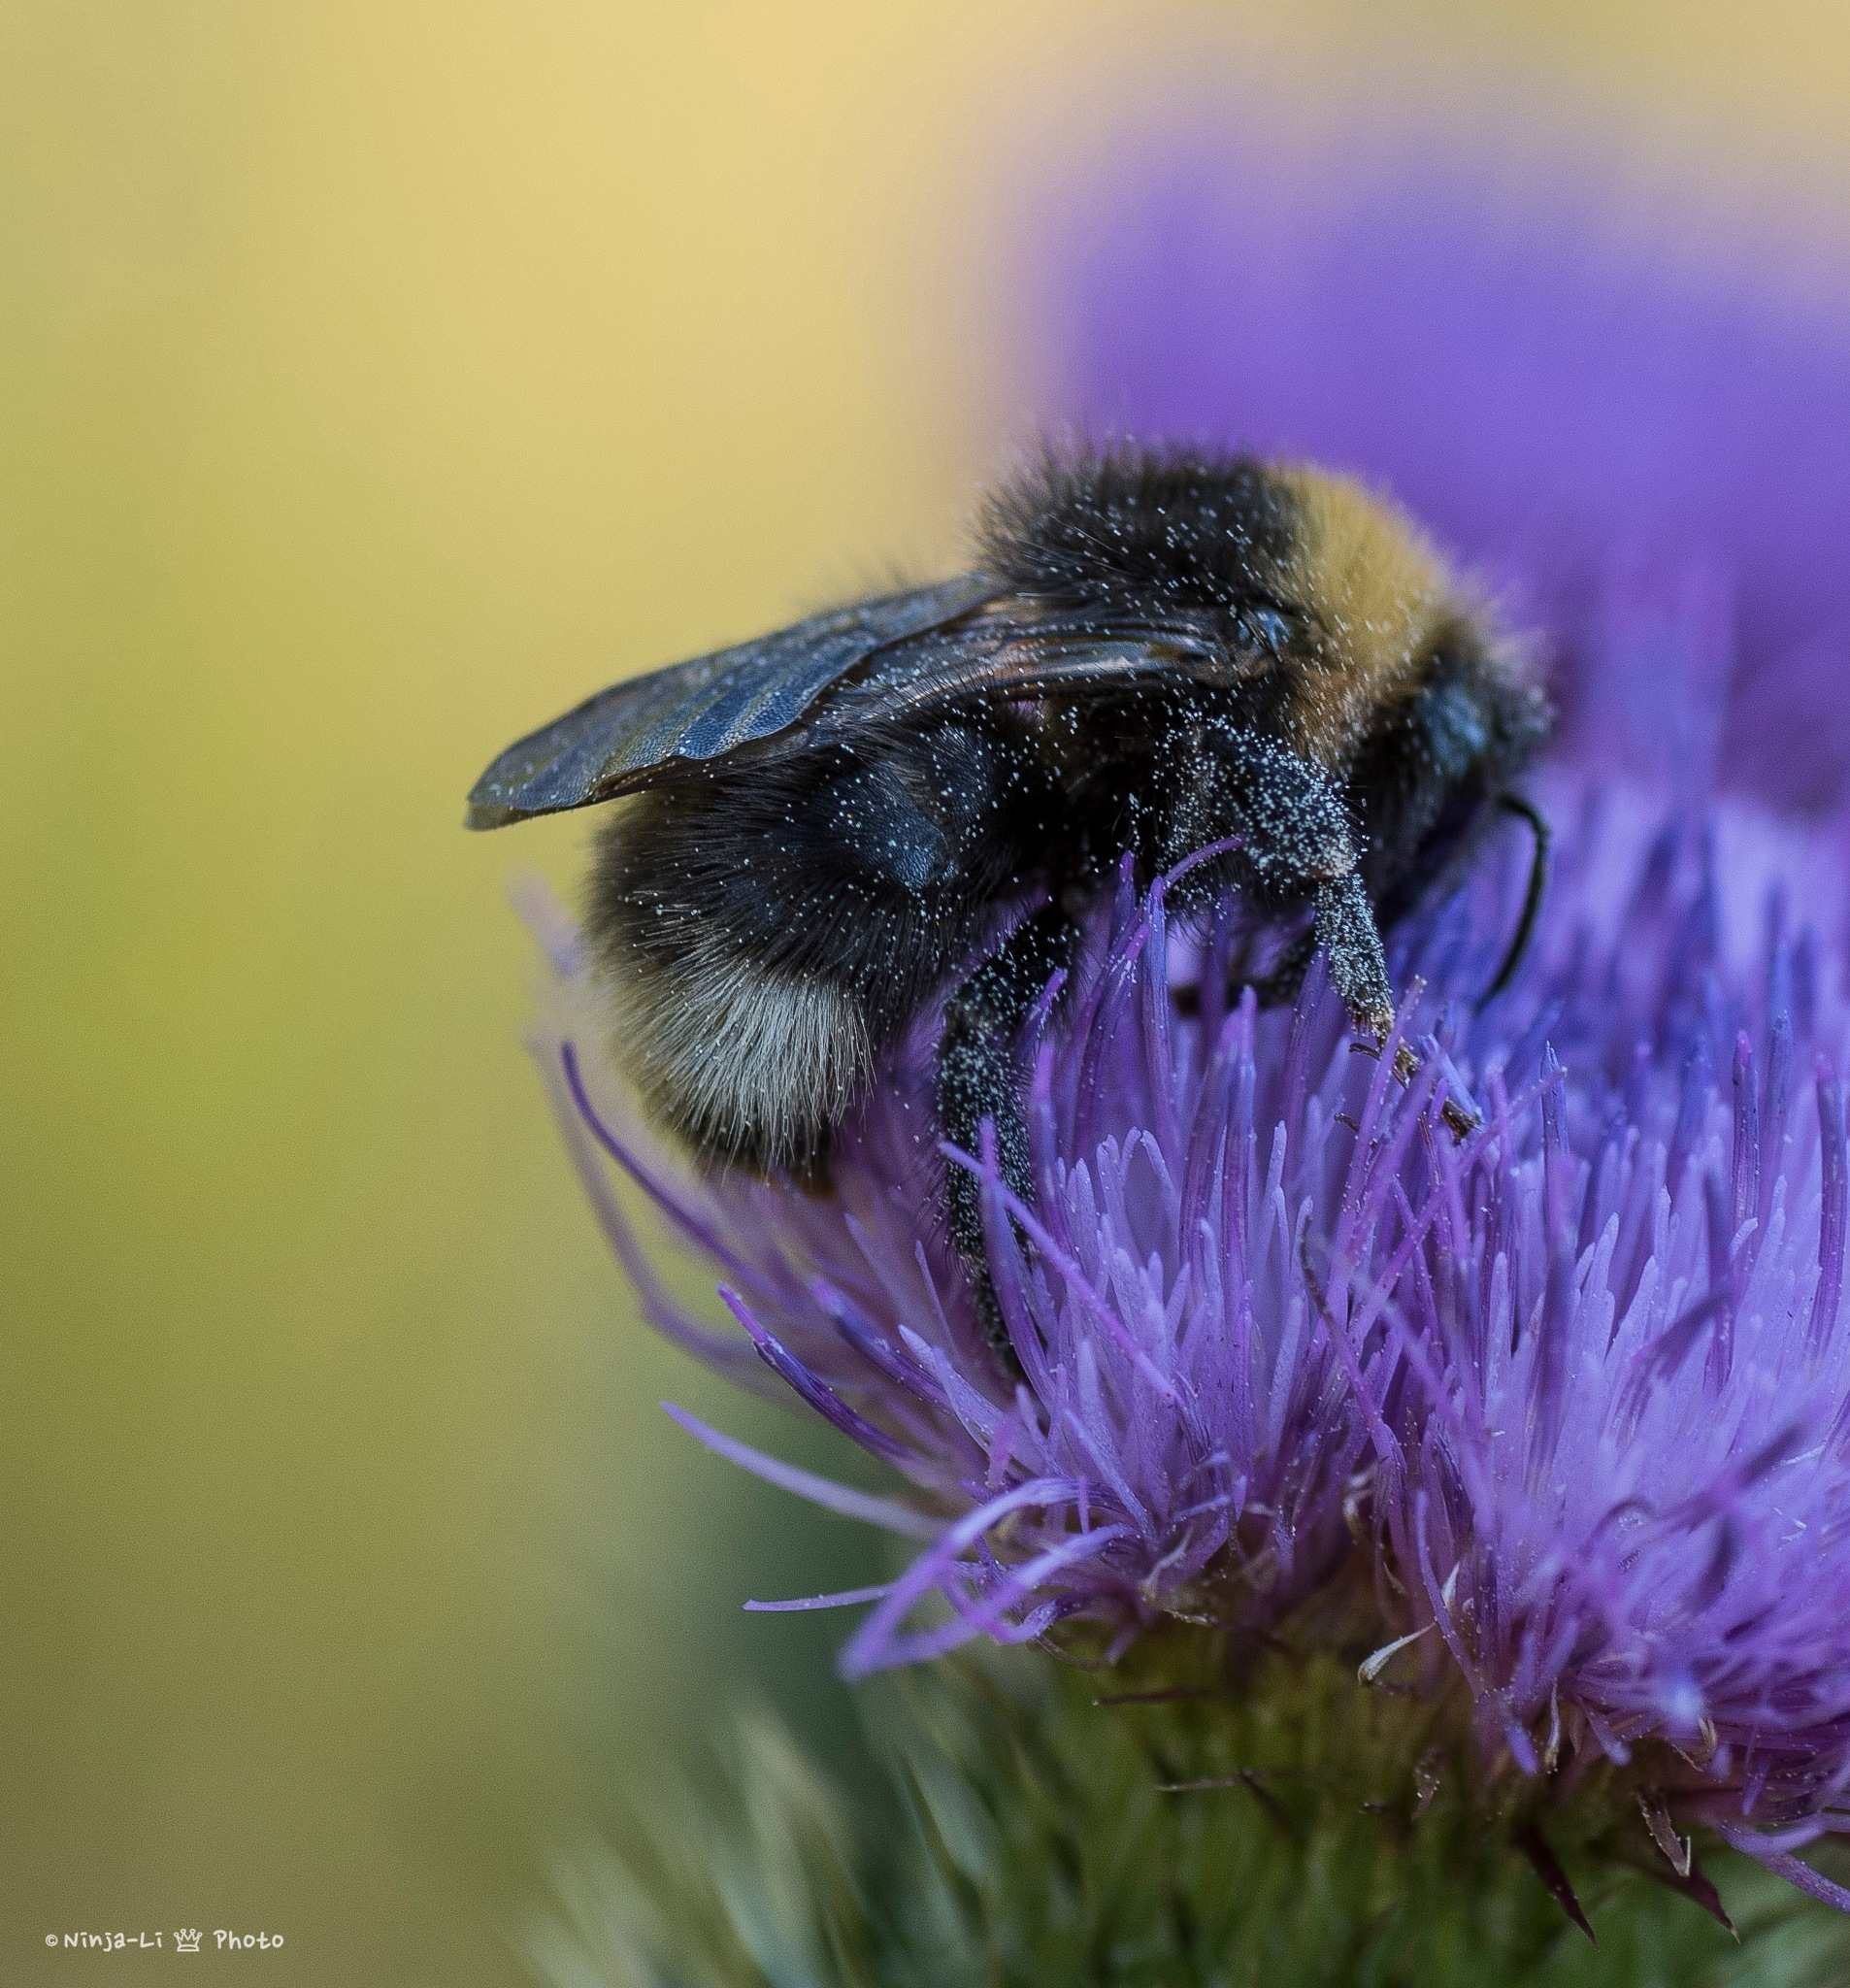 Pollination by Ninja-Li Einarsen Stahre